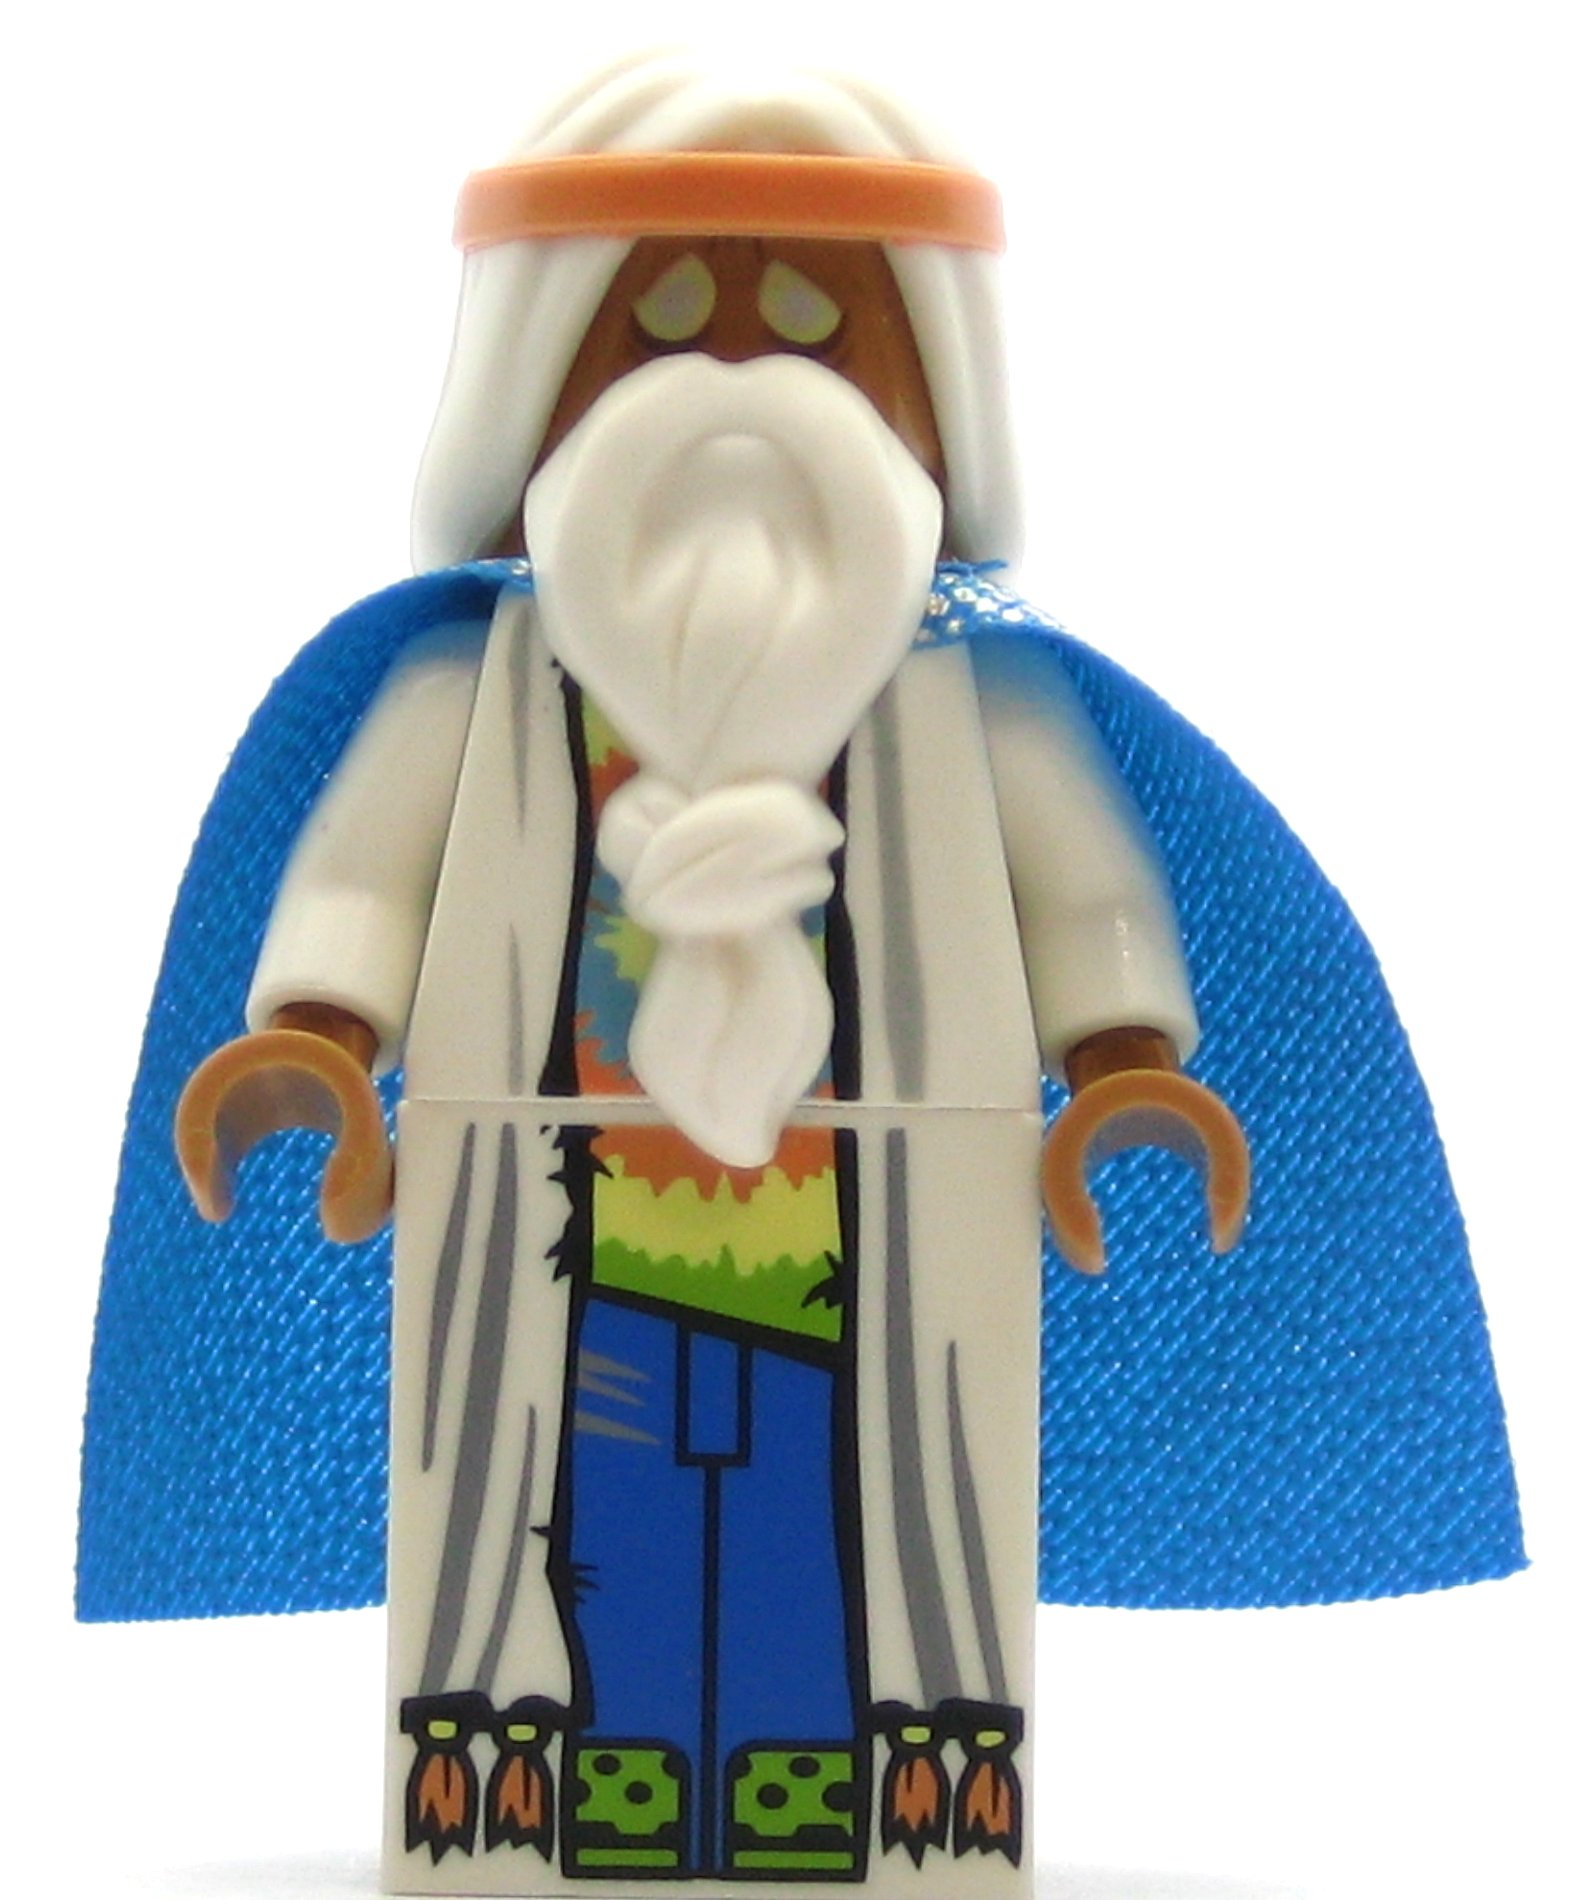 LEGO The Lego Movie Minifigure Vitruvius